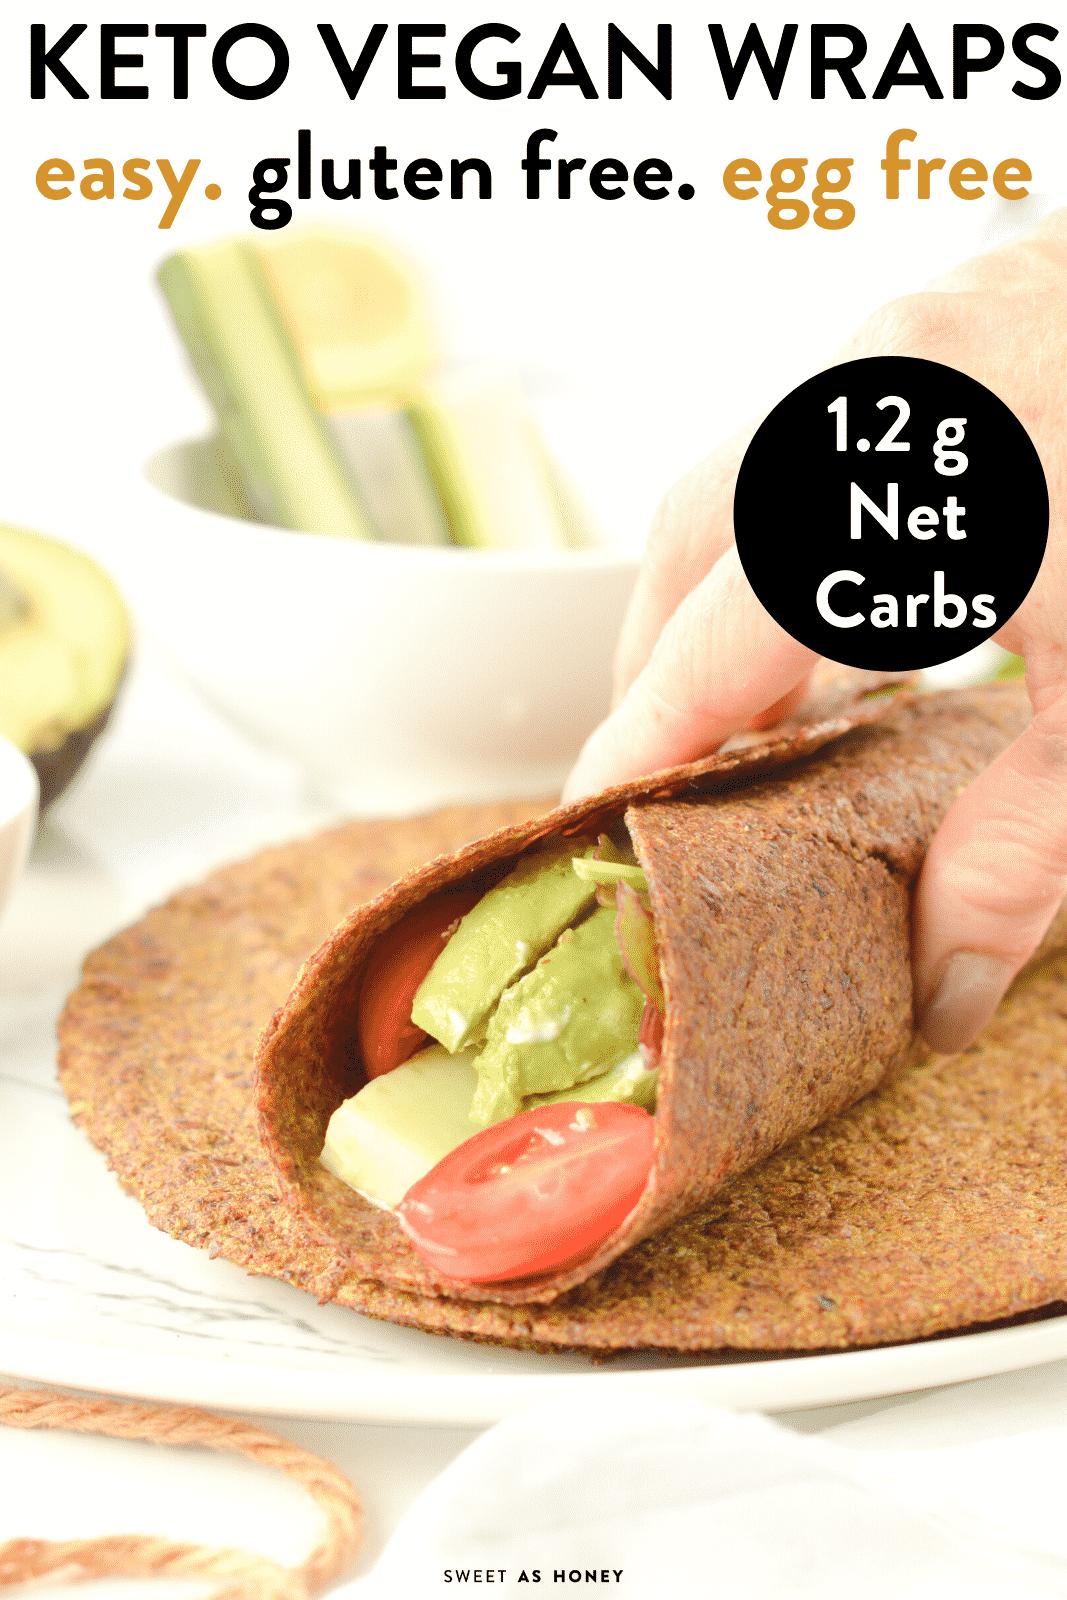 KETO FLAXSEED WRAPS - 4 ingredients easy flexible wraps ready in 10 minutes ! #KETO #KETOWRAPS #KETORECIPES #KETOMEALS #KETOTORTILLAS #TORTILLAS #GLUTENFREE #KETOVEGAN #lowcarb #keto #wraps #tortillas #vegan